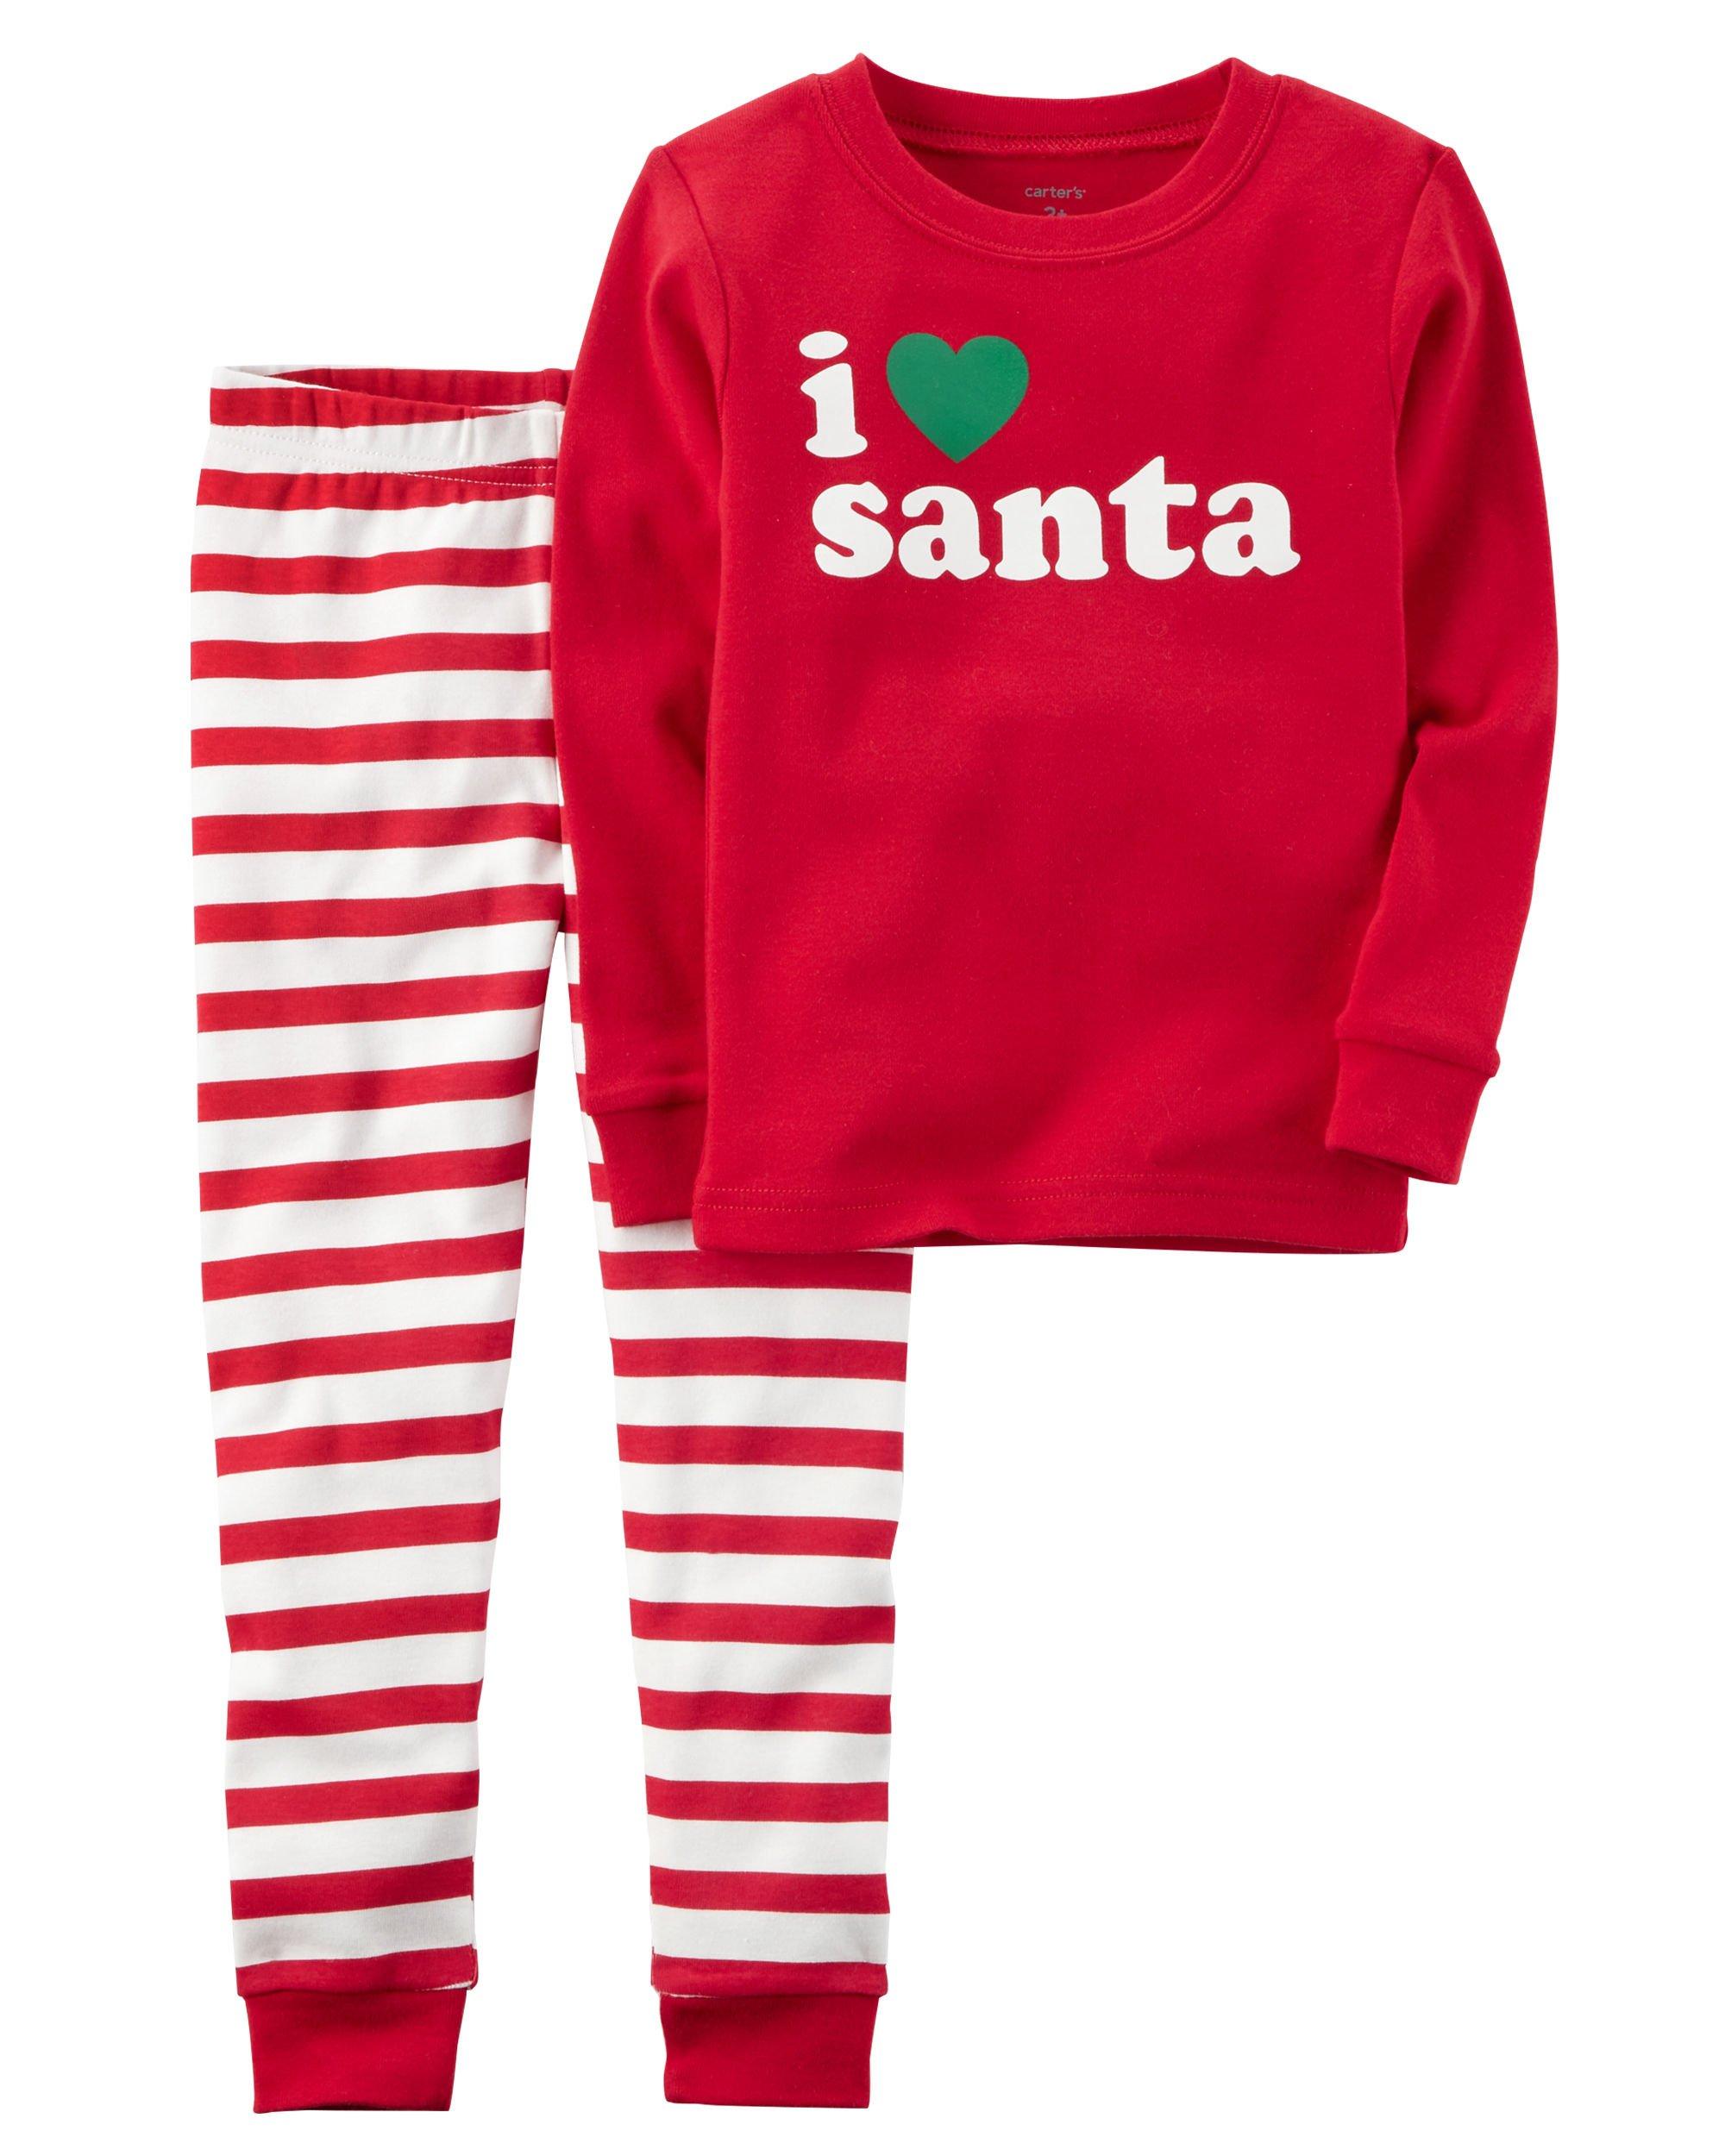 b30406c60461 Carter s Carters Baby Unisex Holiday 2-Piece Santa Snug Fit Cotton ...